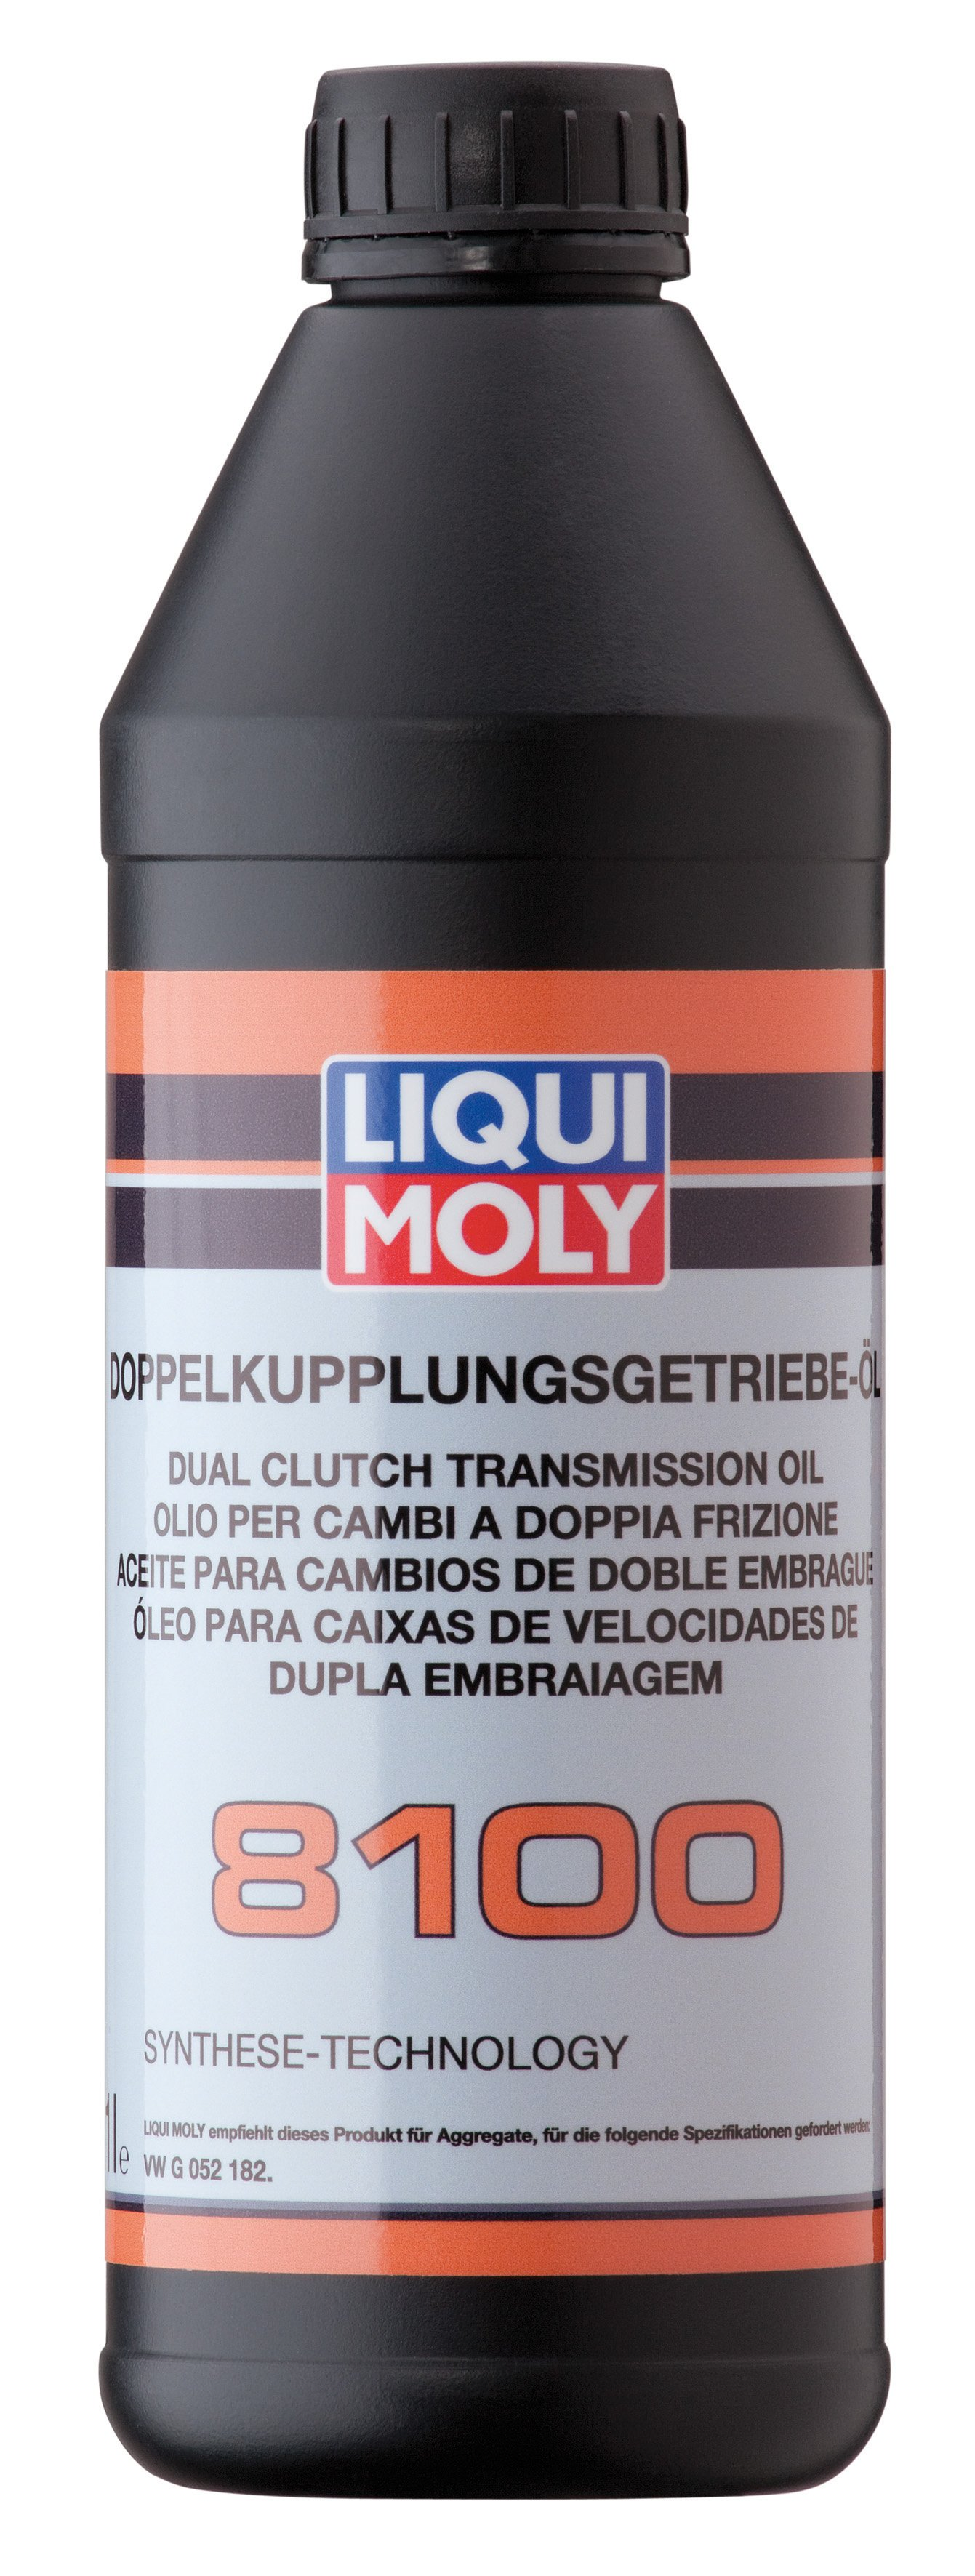 Liqui Moly DOPPELKUPPLUNGSGETRIEBE-OL 8100 (DSG) 1л